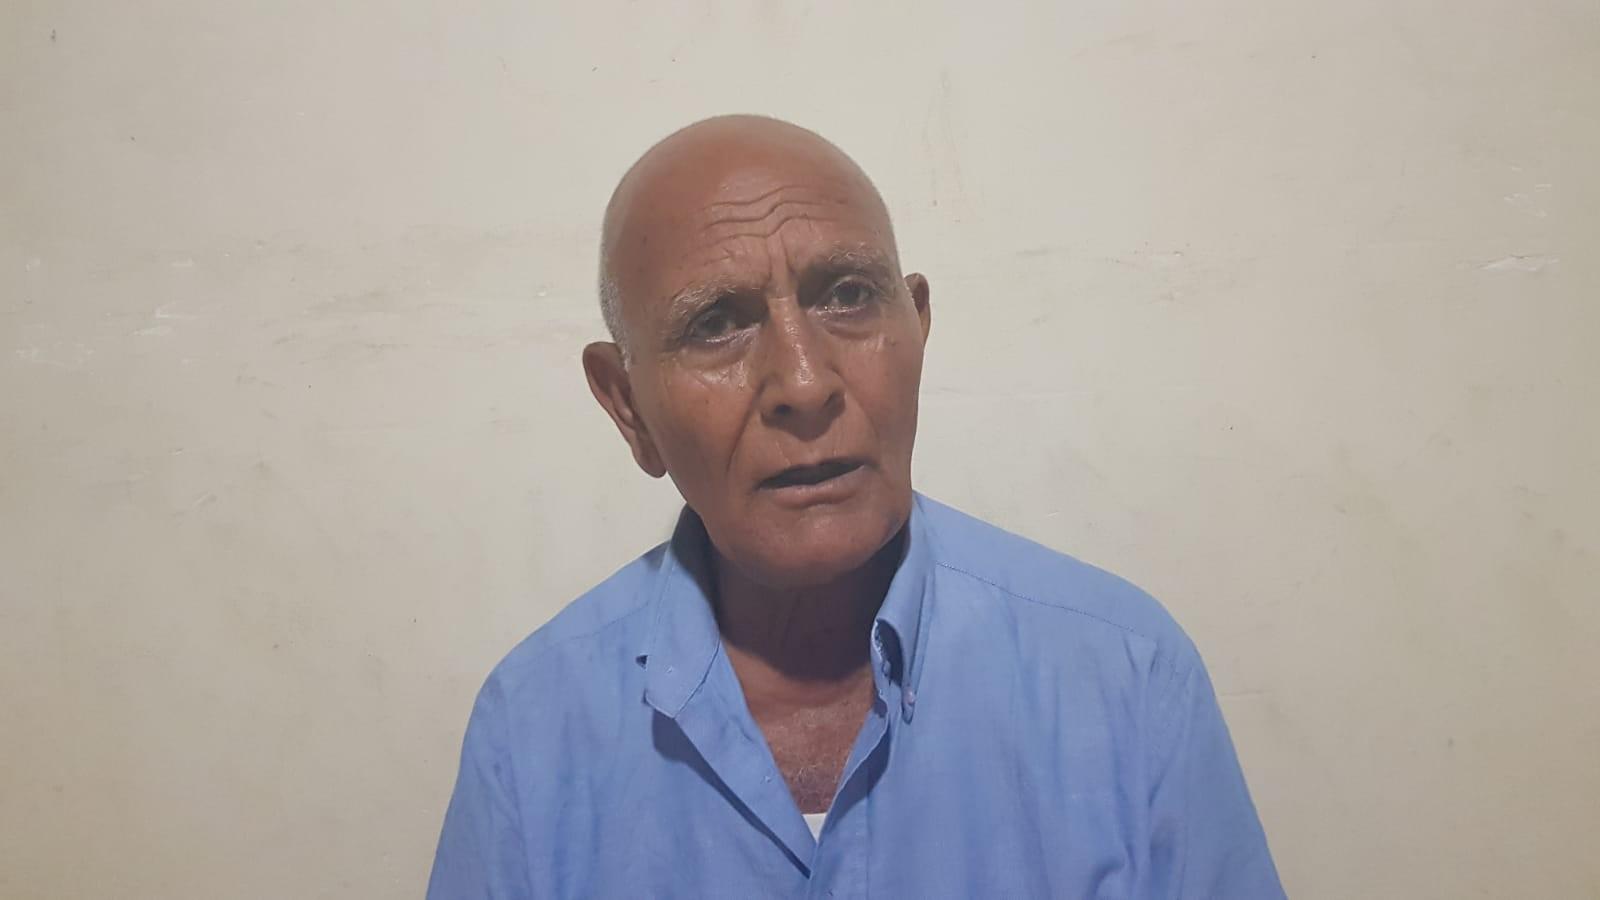 أبو مطير: شهدتُ تهجير عائلتي